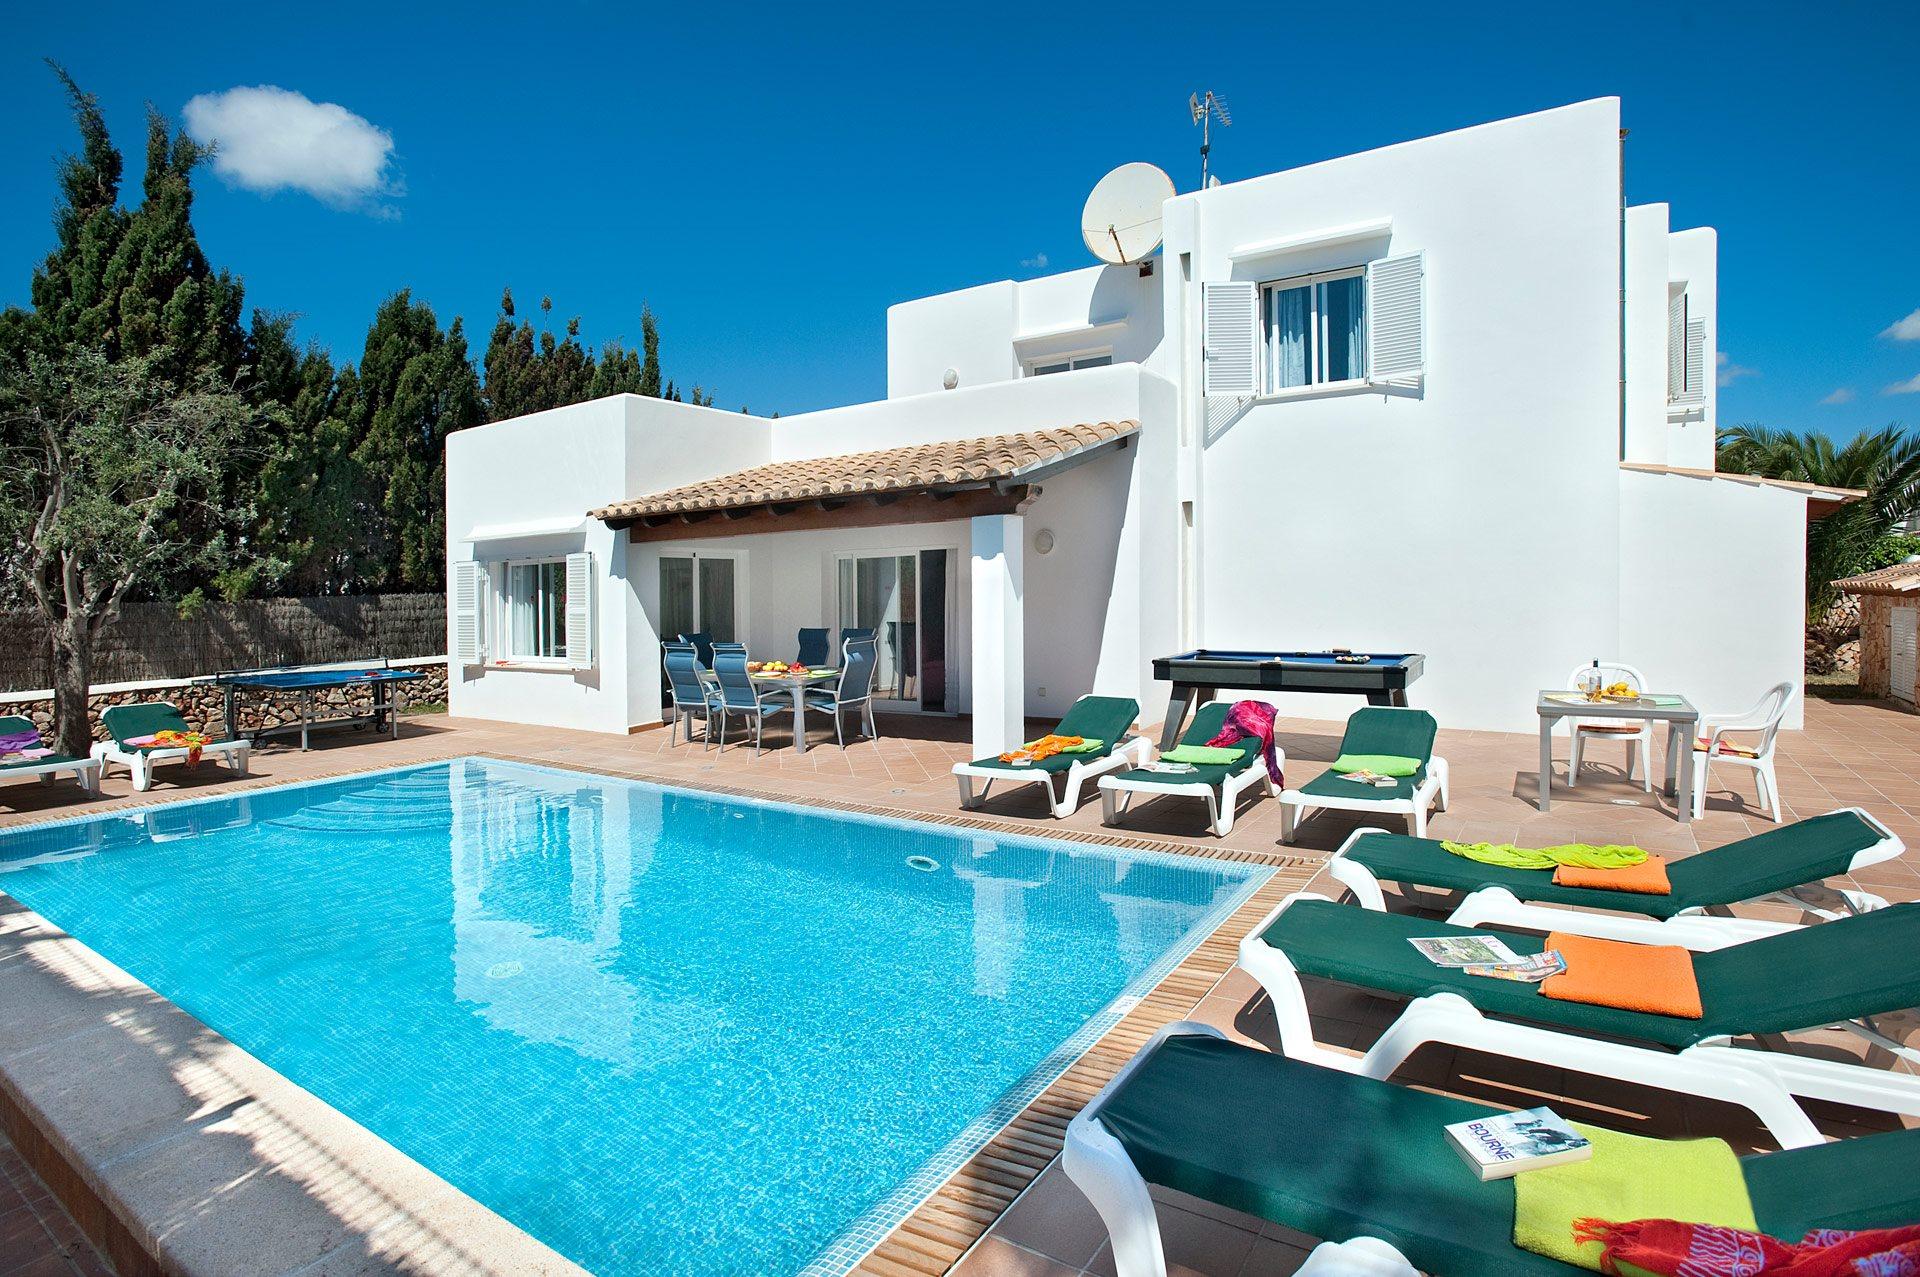 Villa Estribor, Cala D'or, Majorca, Spain